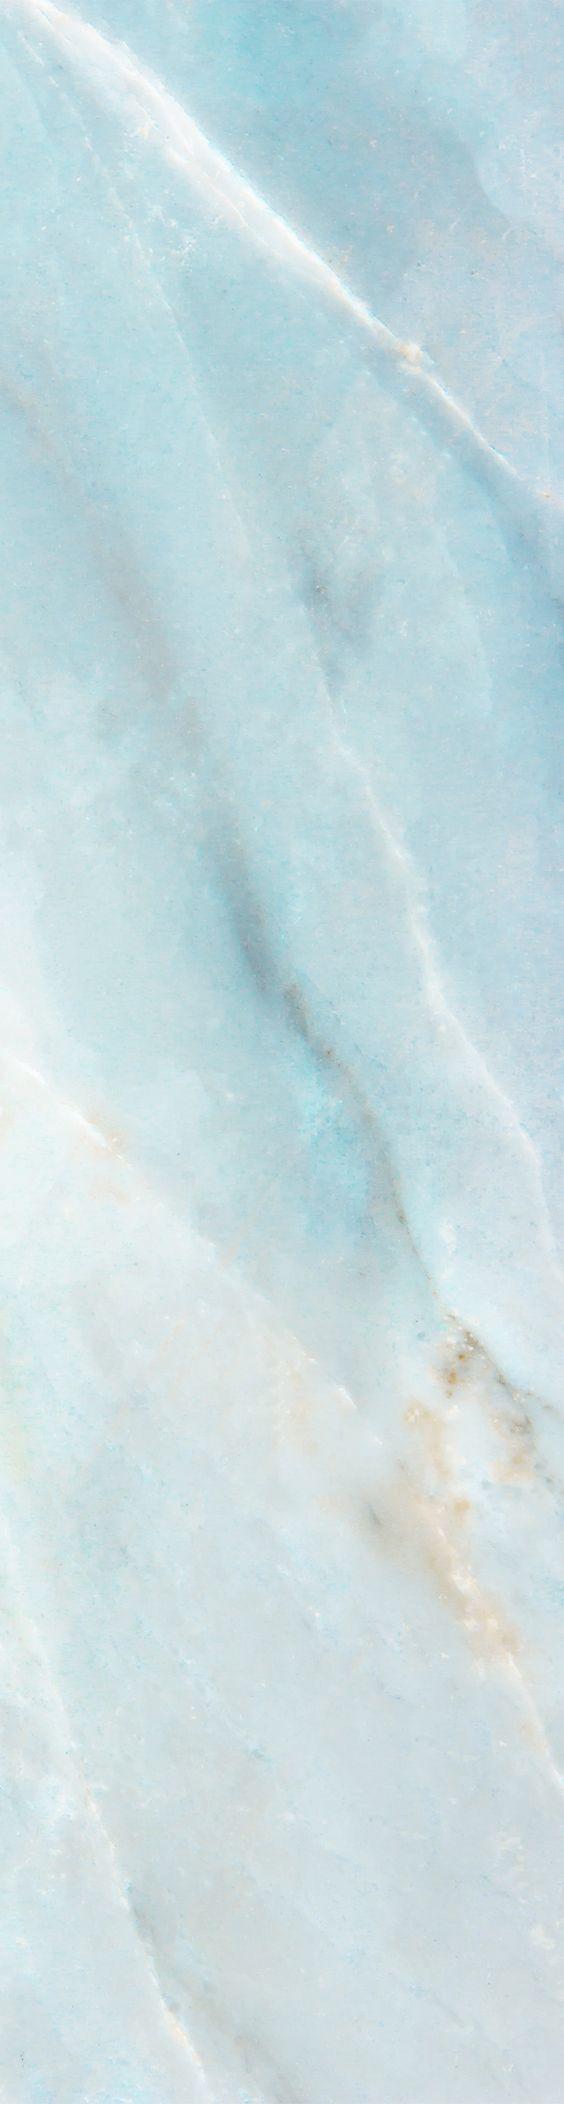 Message Wallpaper Marble Iphone Wallpaper Blue Marble Wallpaper Ipod Wallpaper